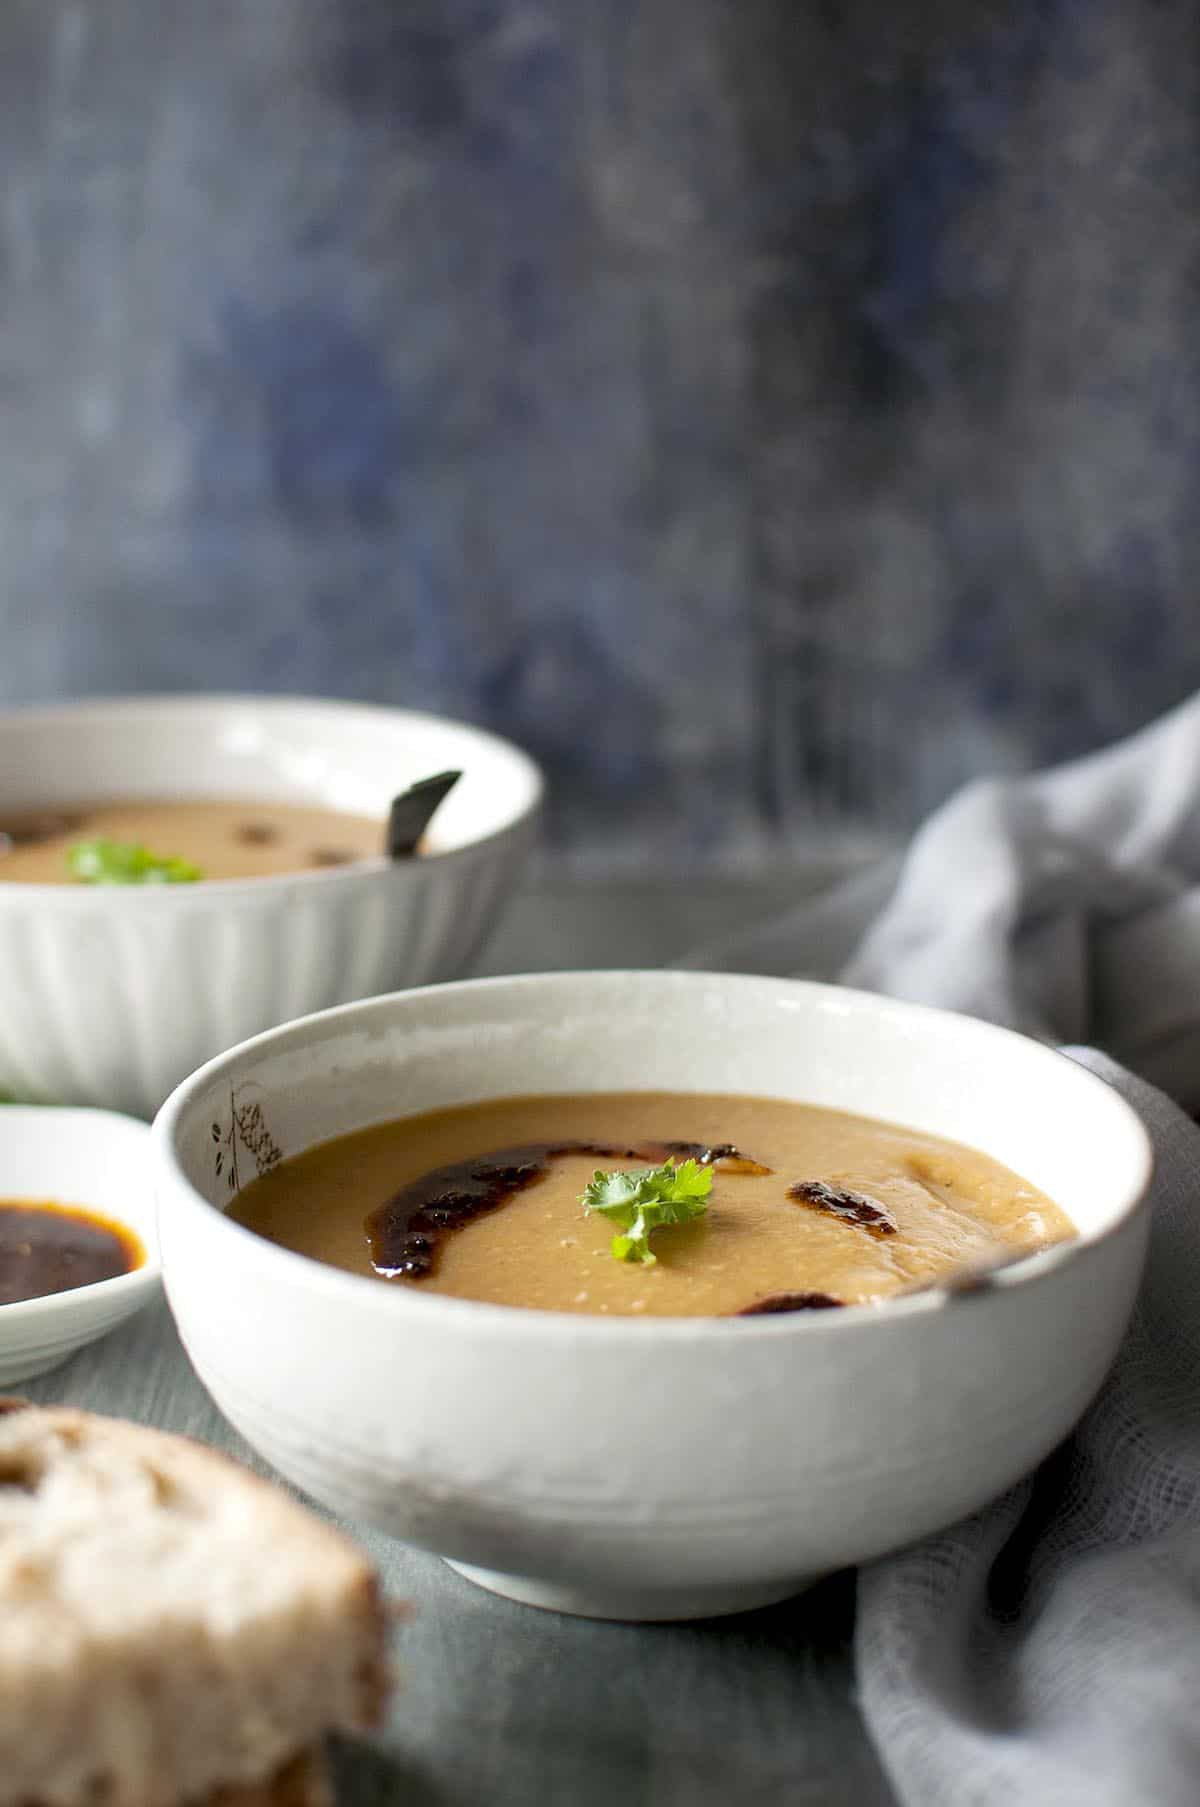 White bowl with creamy lentil soup